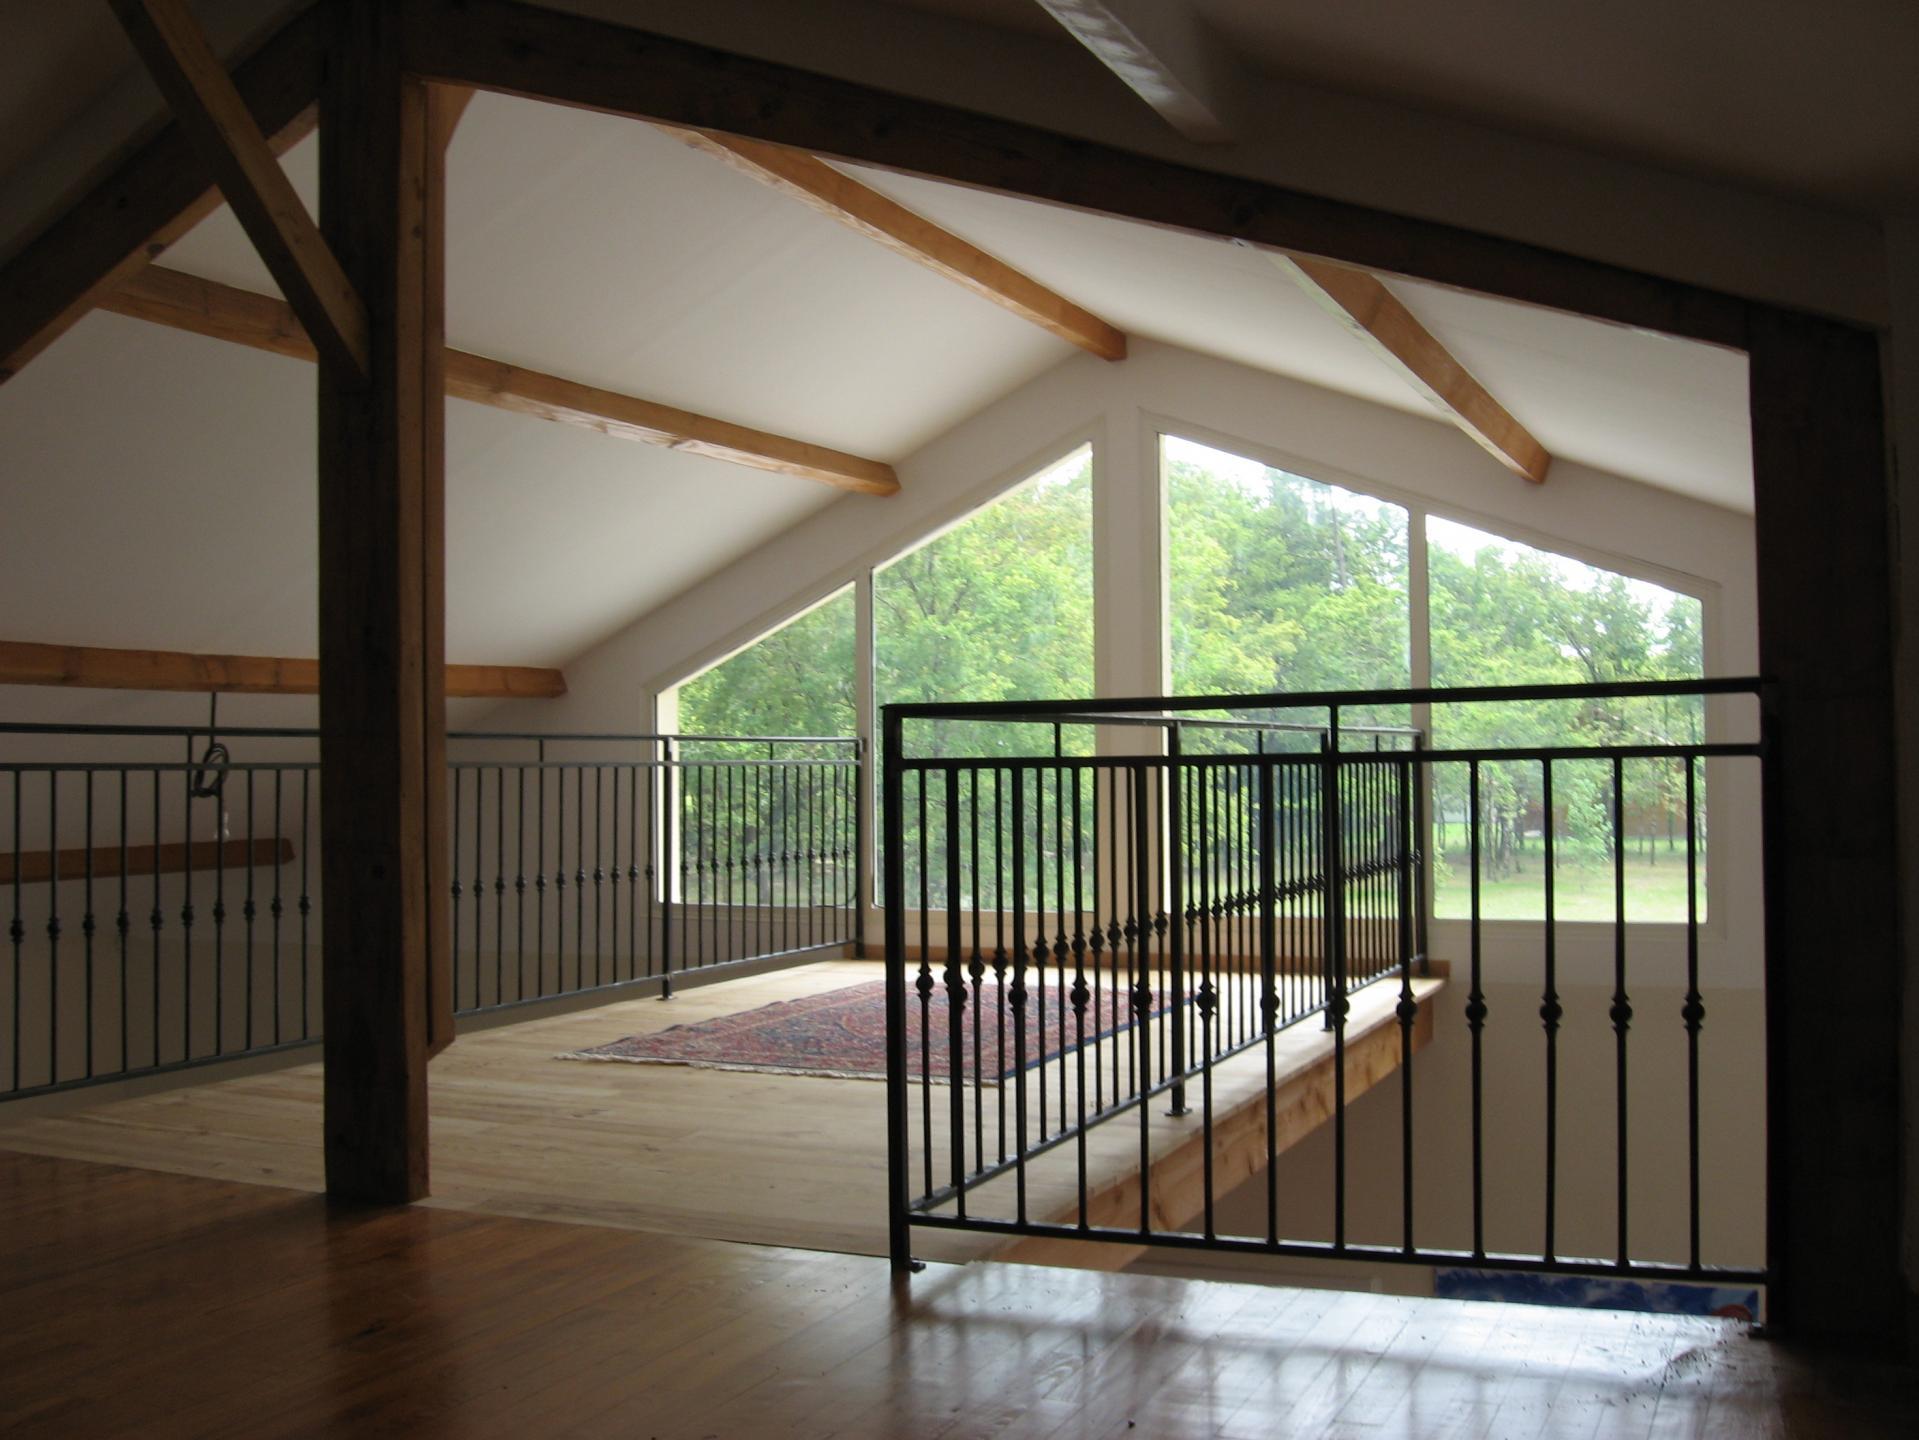 metallerie ferronnerie chaudronnerie acier inox alu. Black Bedroom Furniture Sets. Home Design Ideas